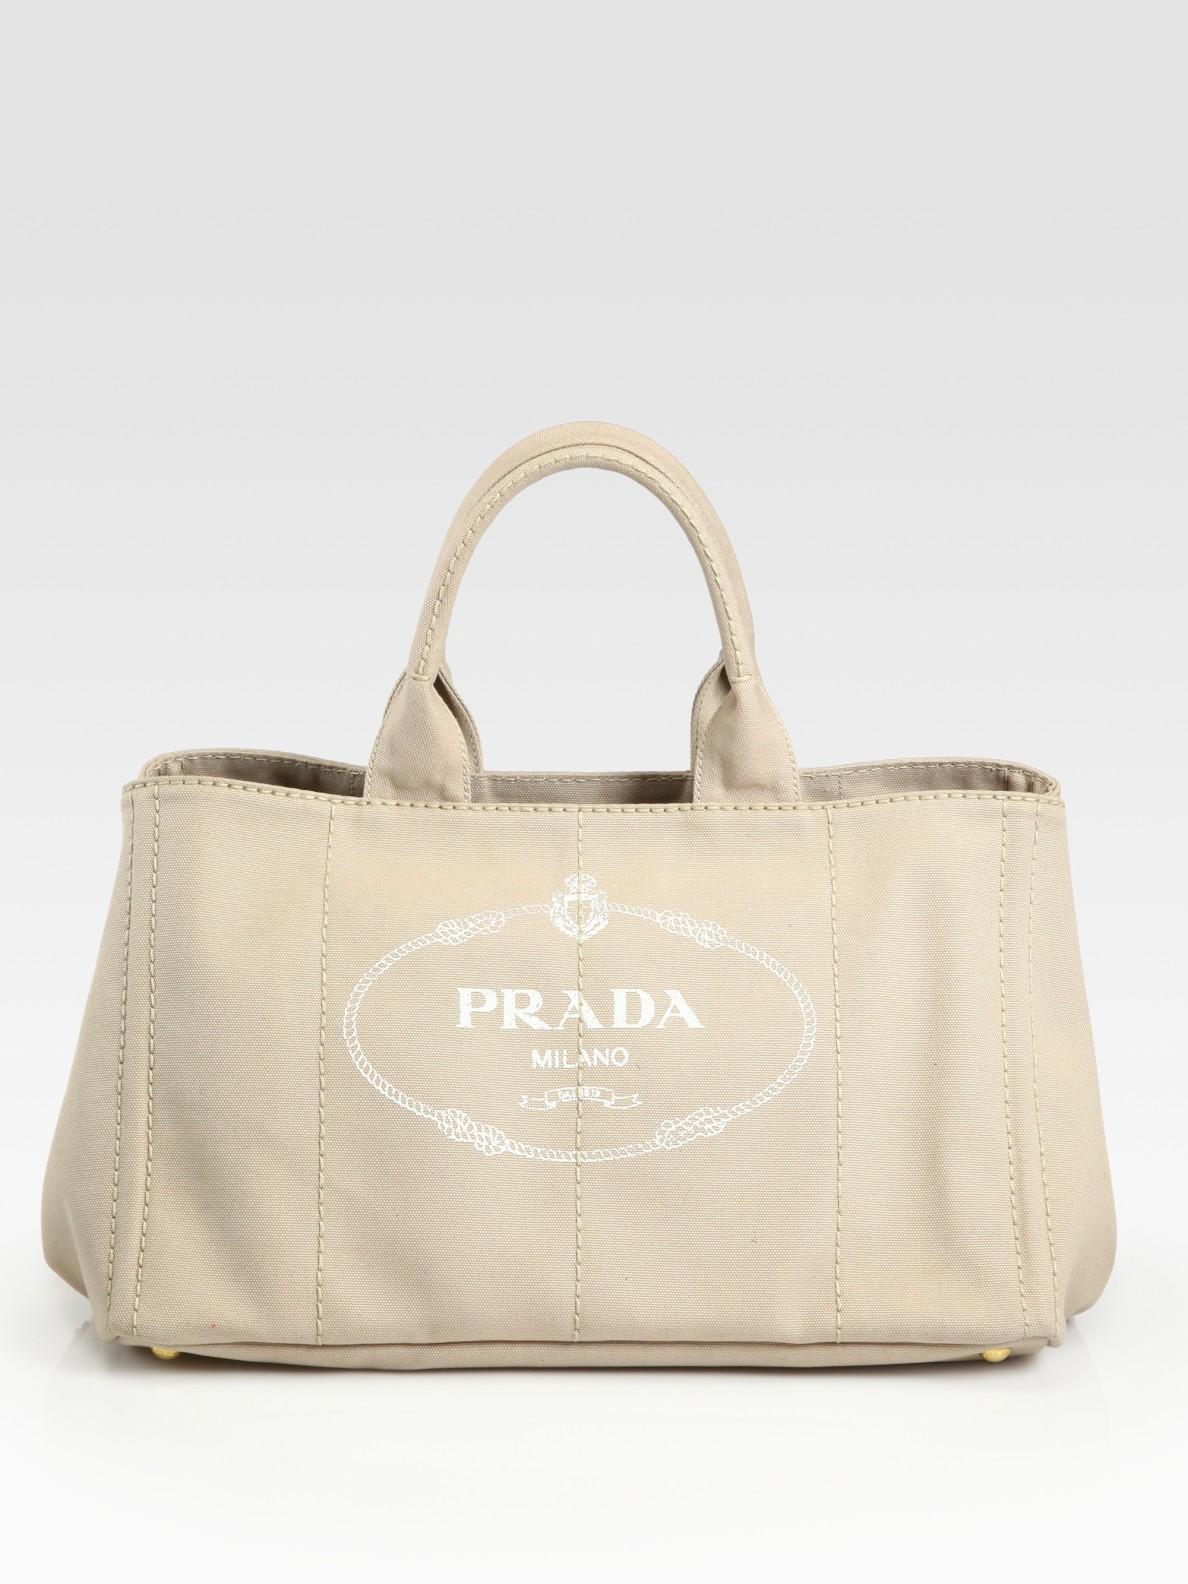 Prada Logo-Printed Leather Tote PuwpQR